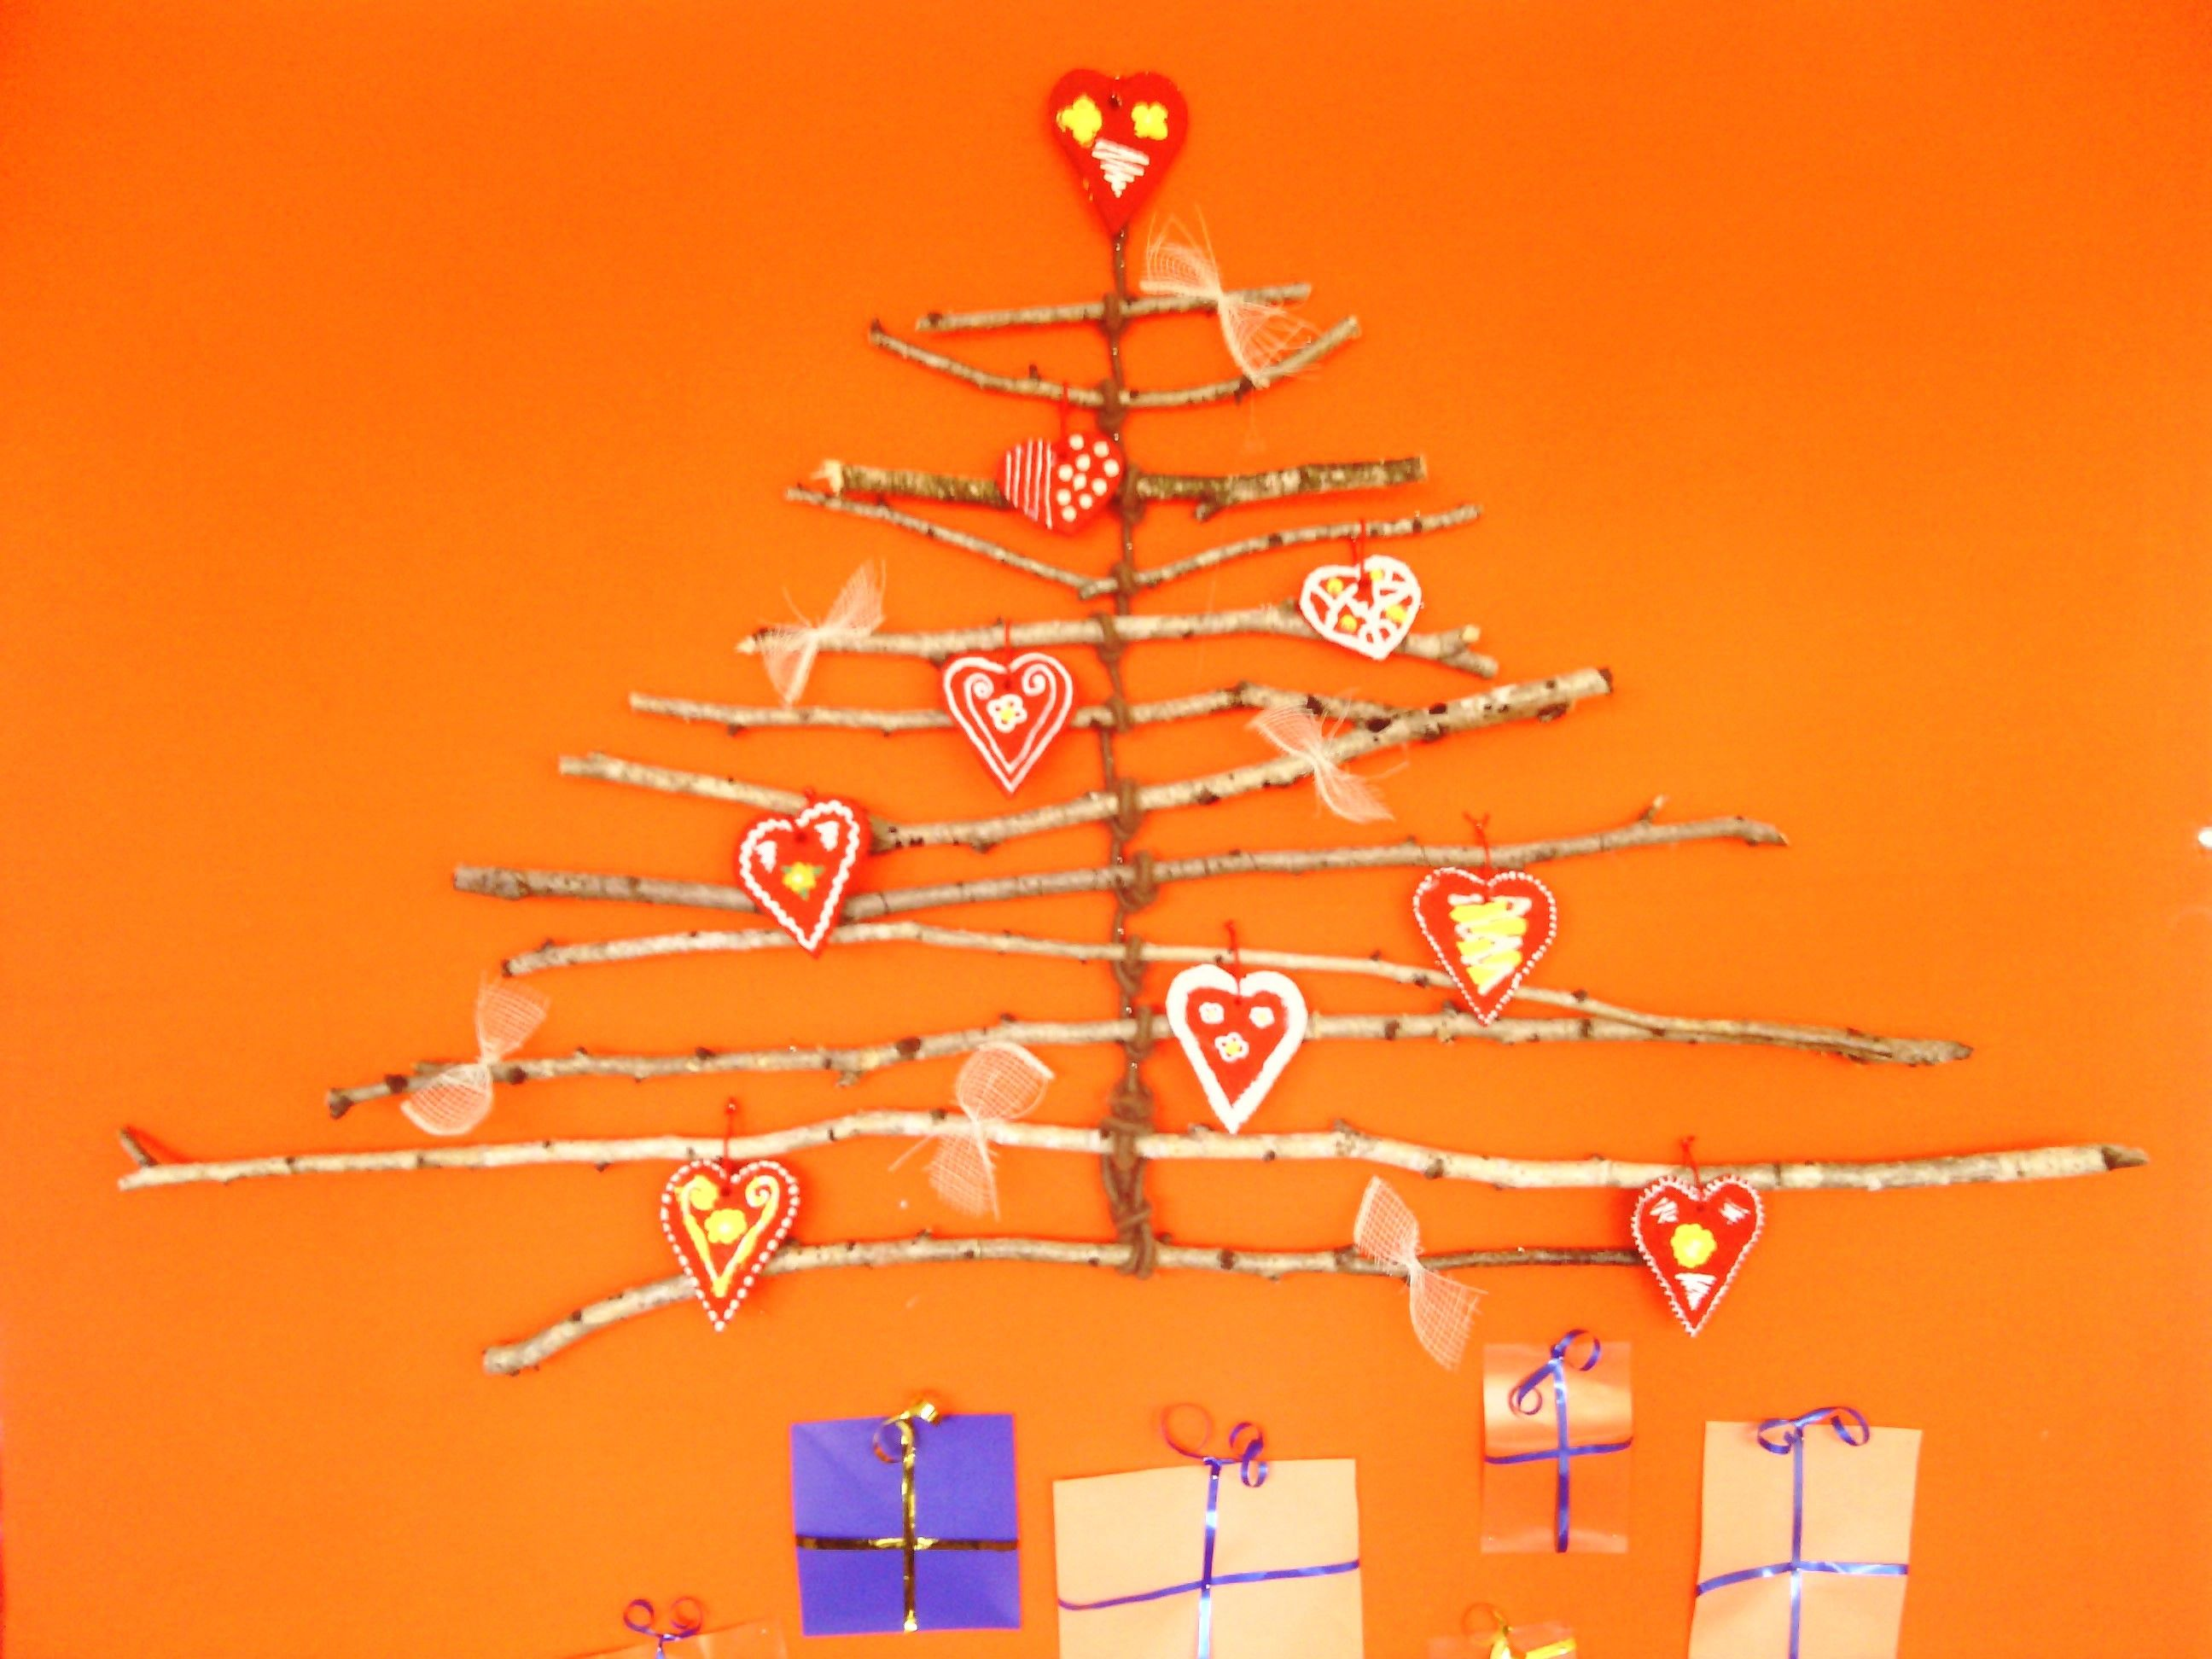 Bor od grančica breze i licitarskih srca Christmas tree from birch